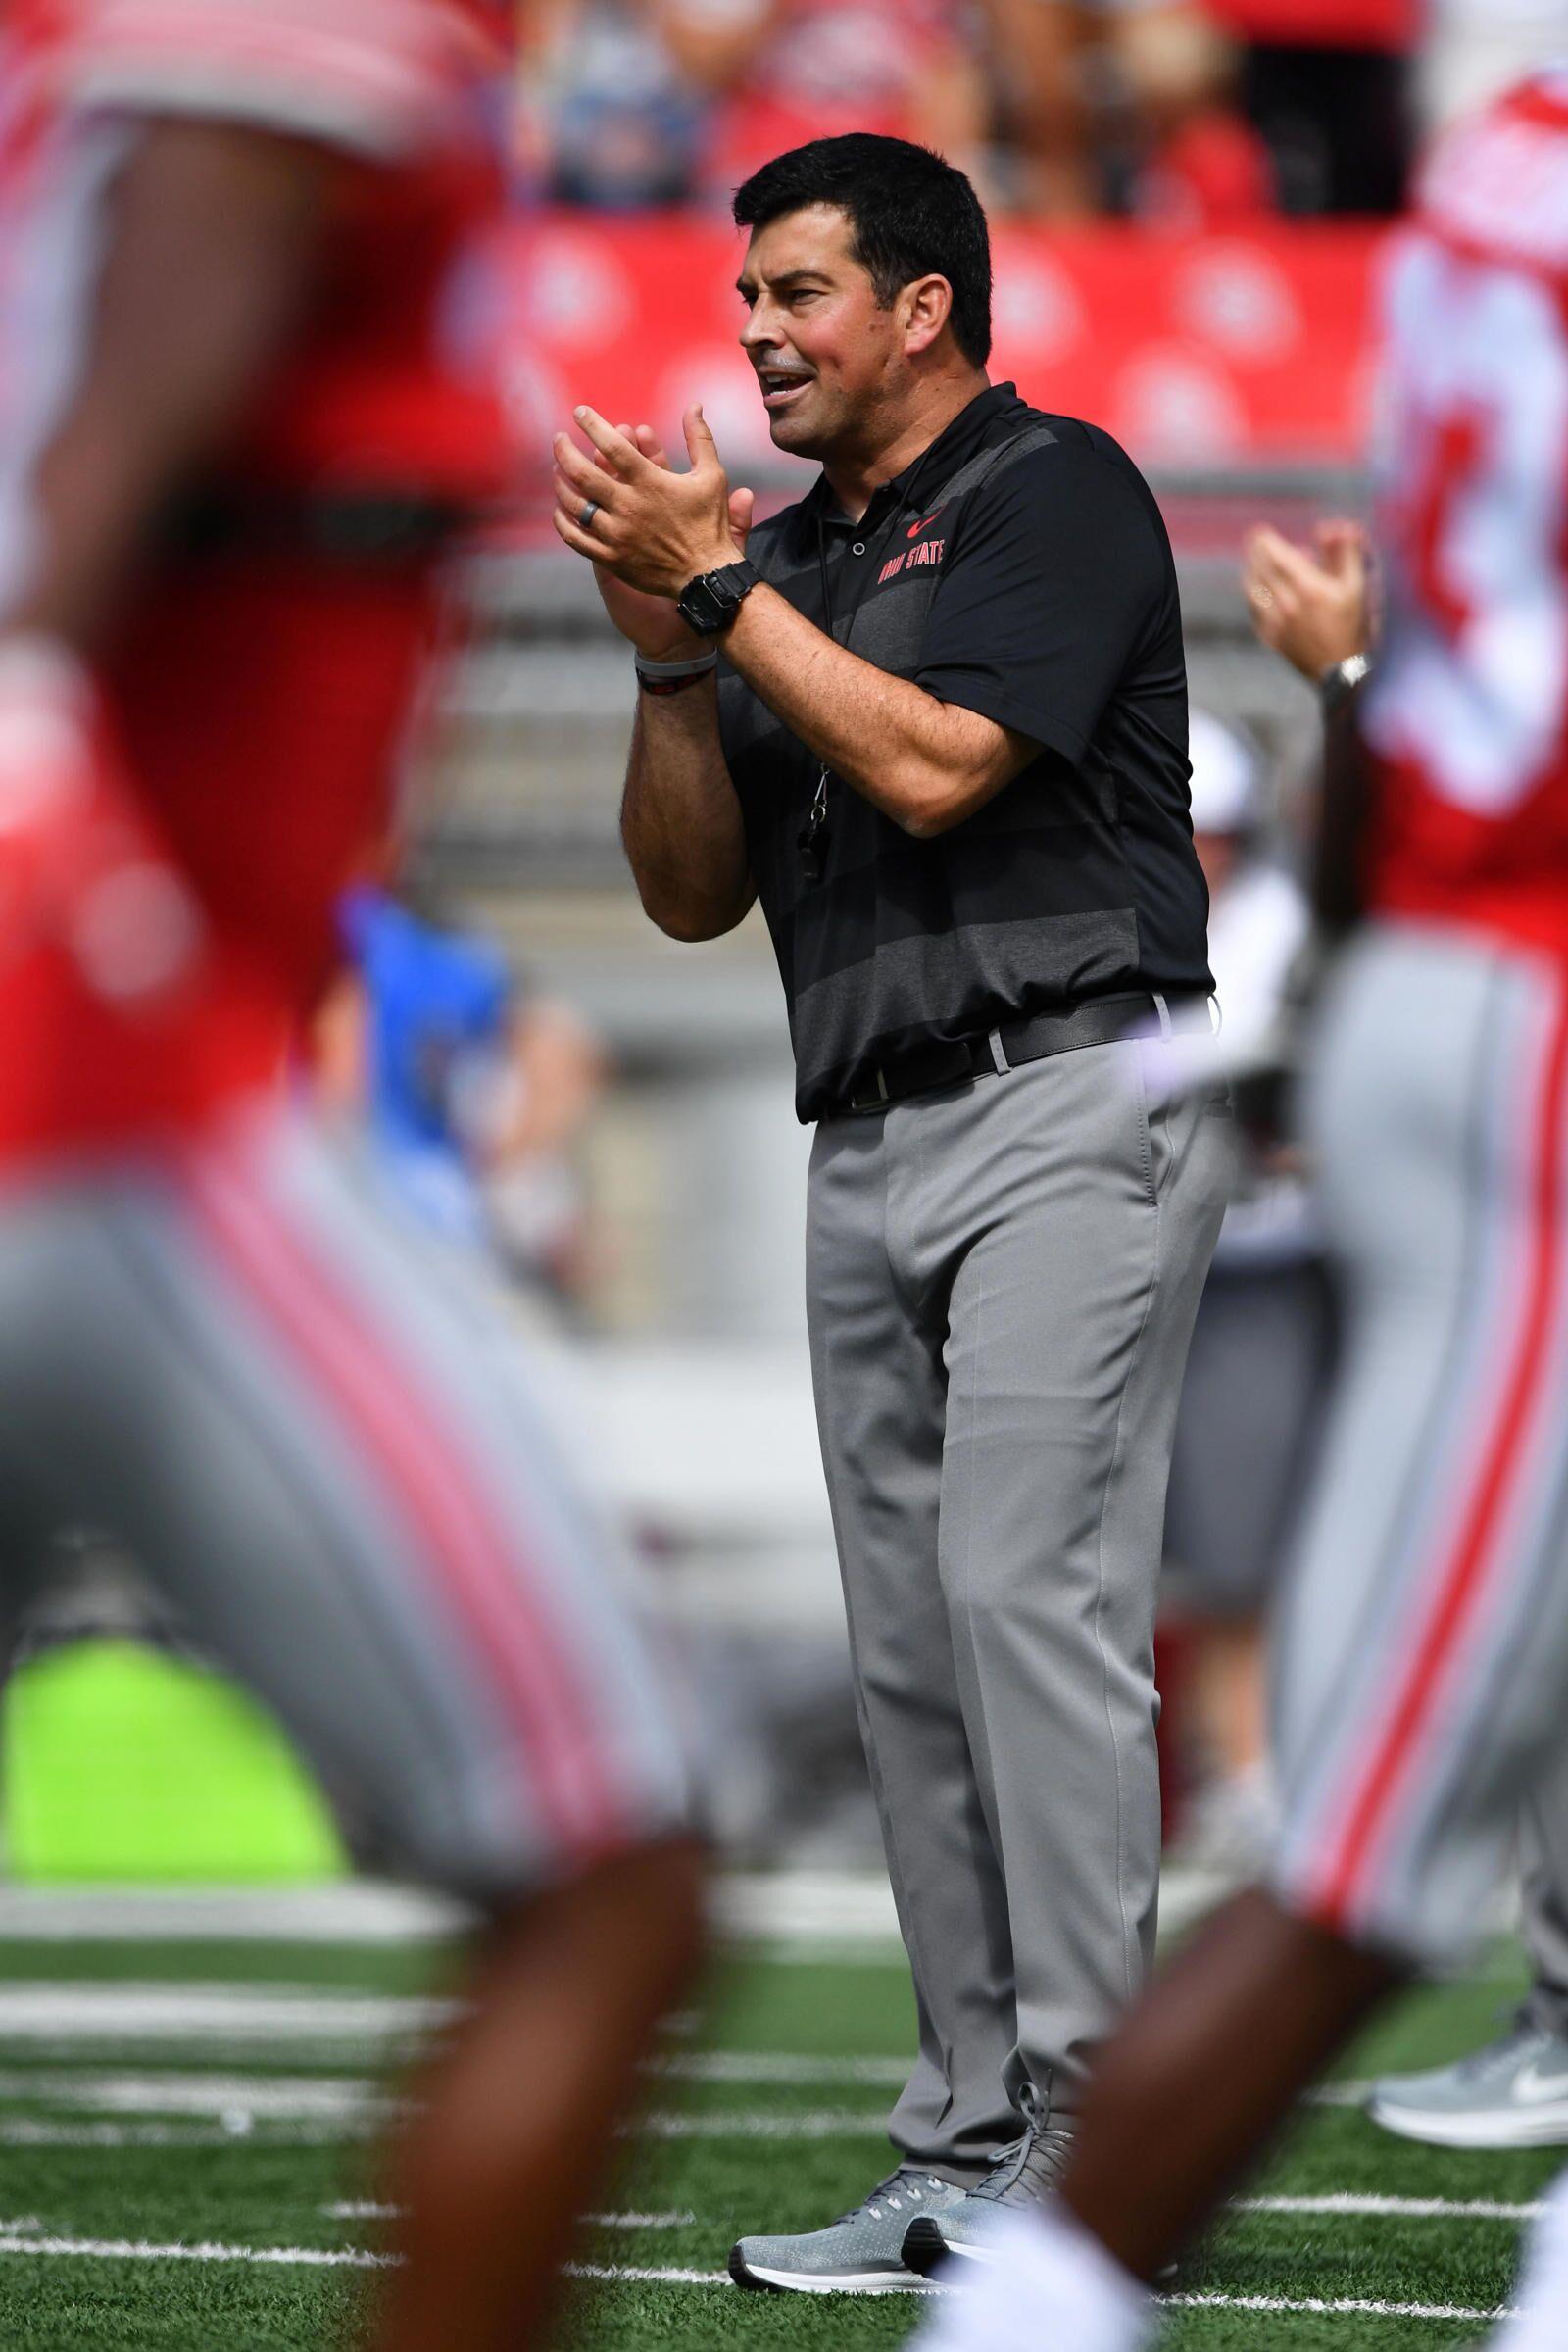 Ohio State Football: Hot start to summer recruiting